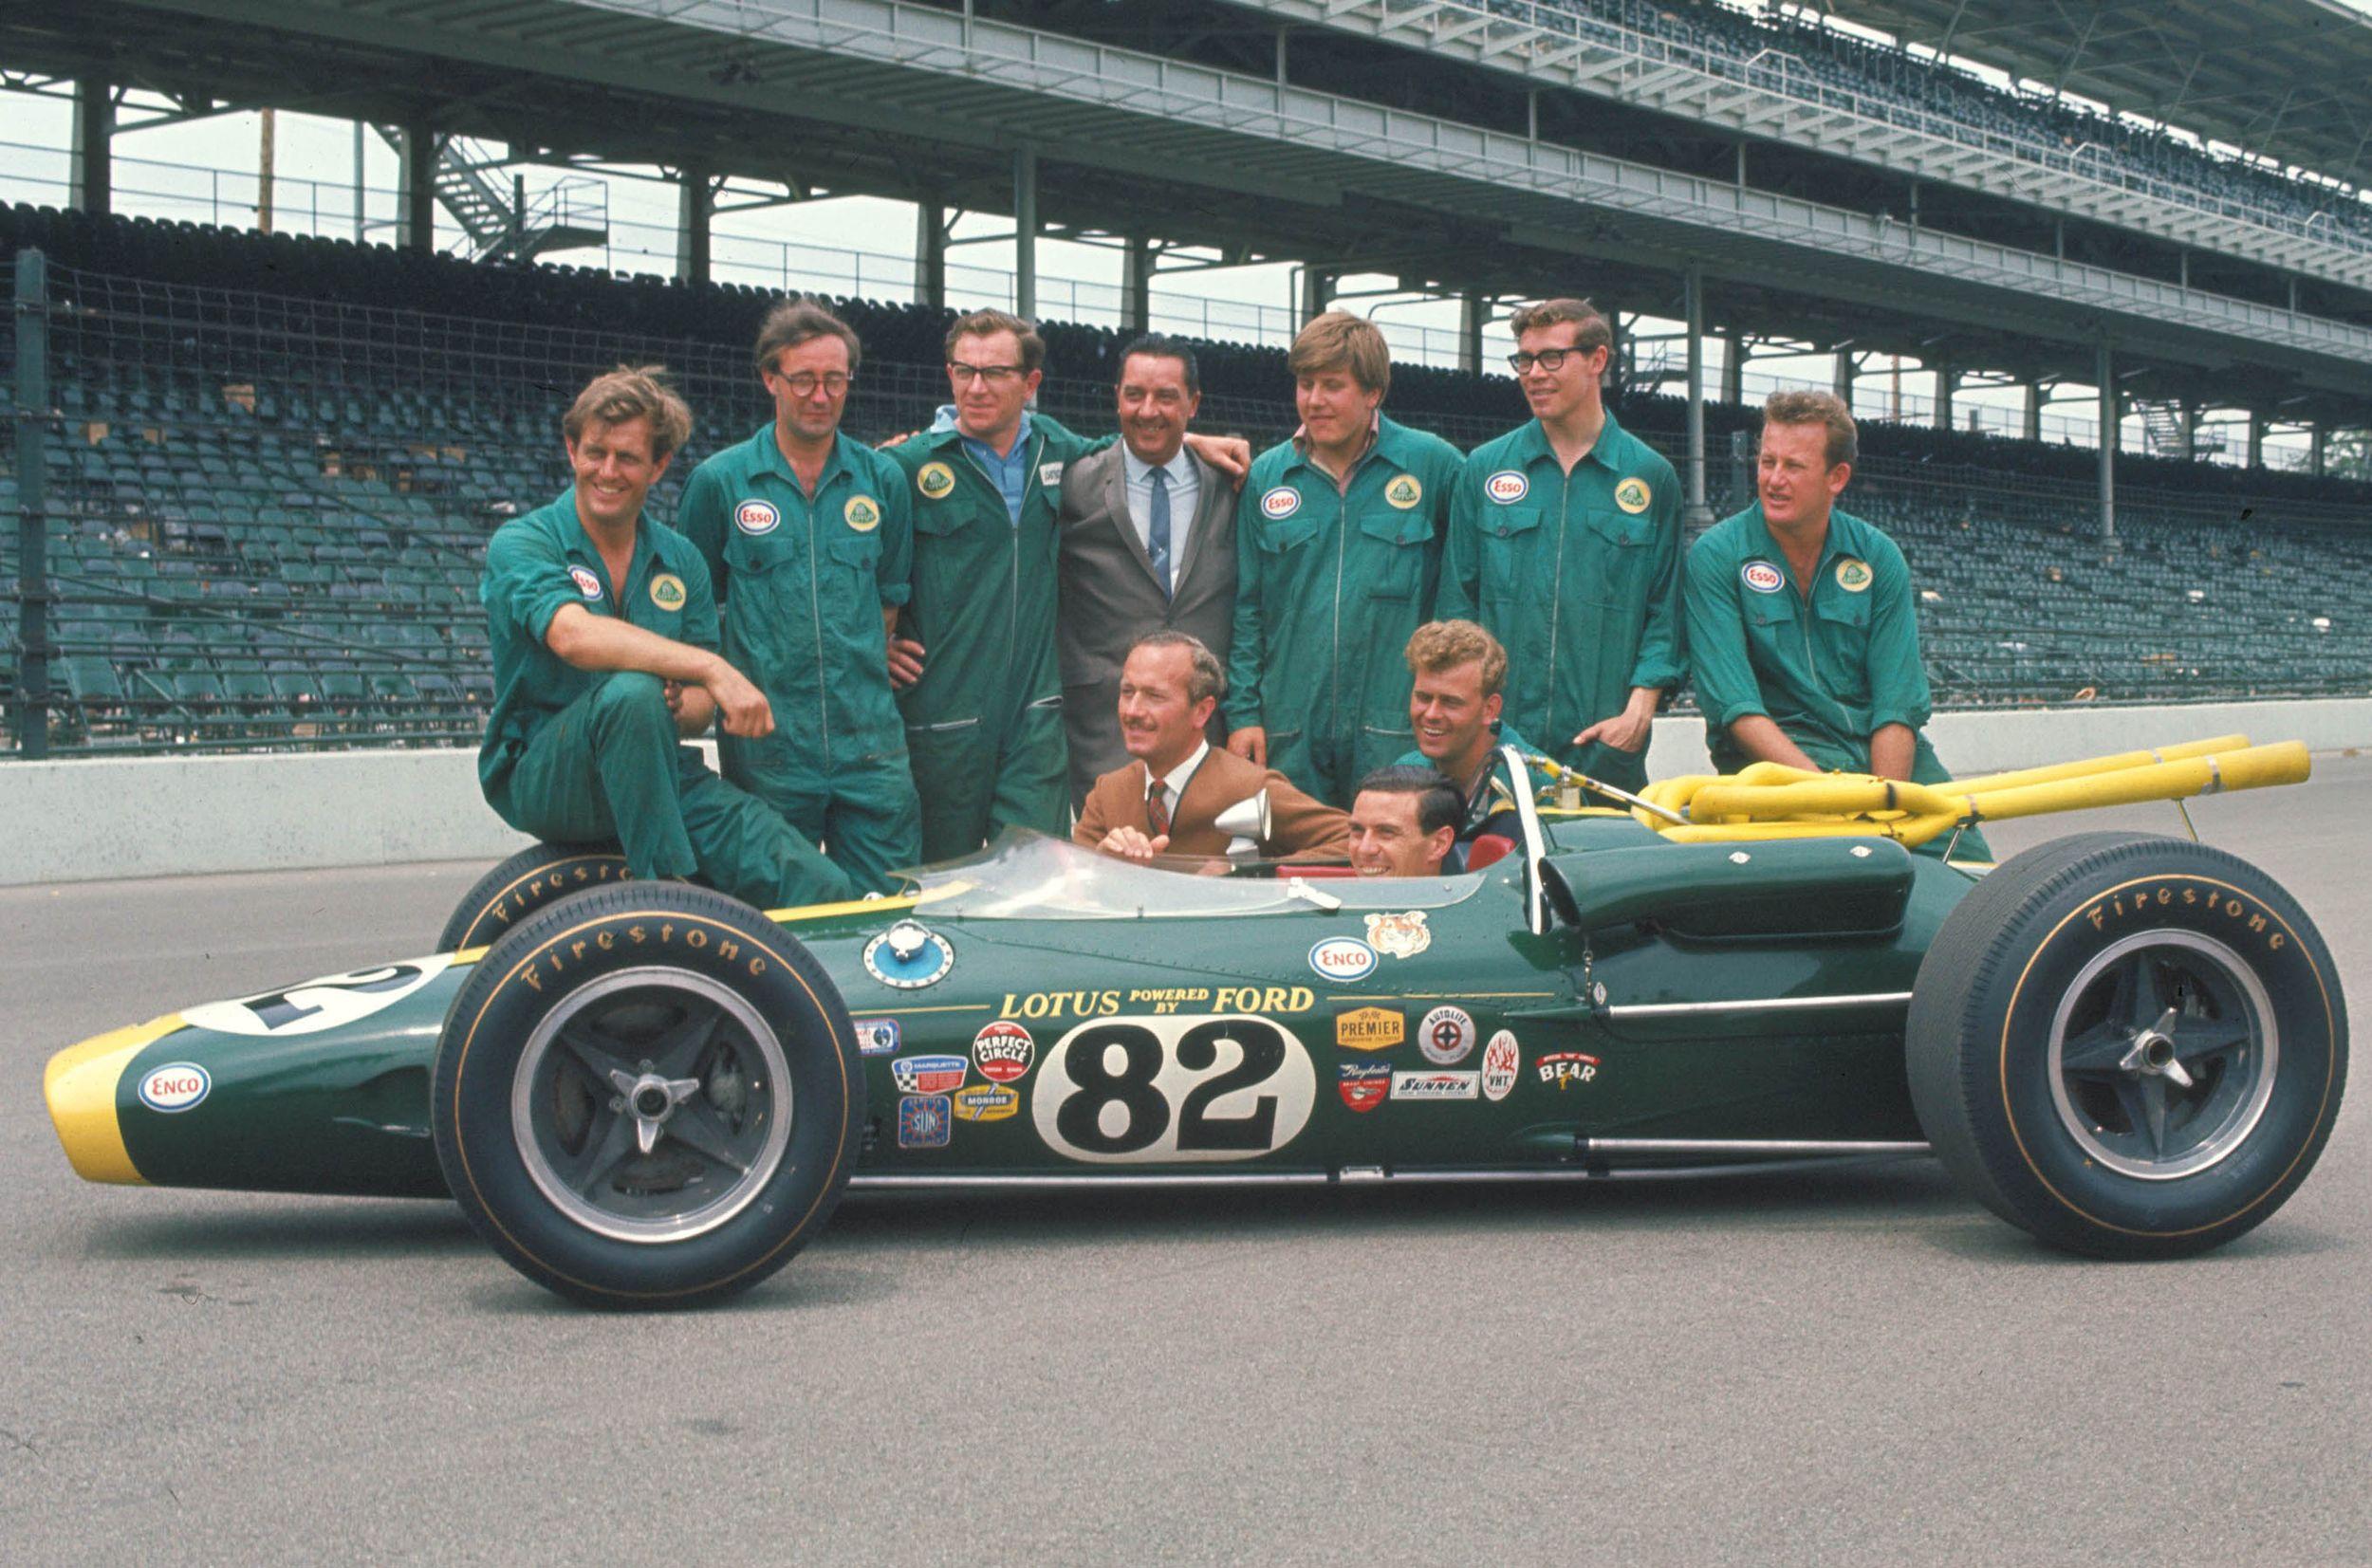 1965 World Champion - Jim Clark (UK)